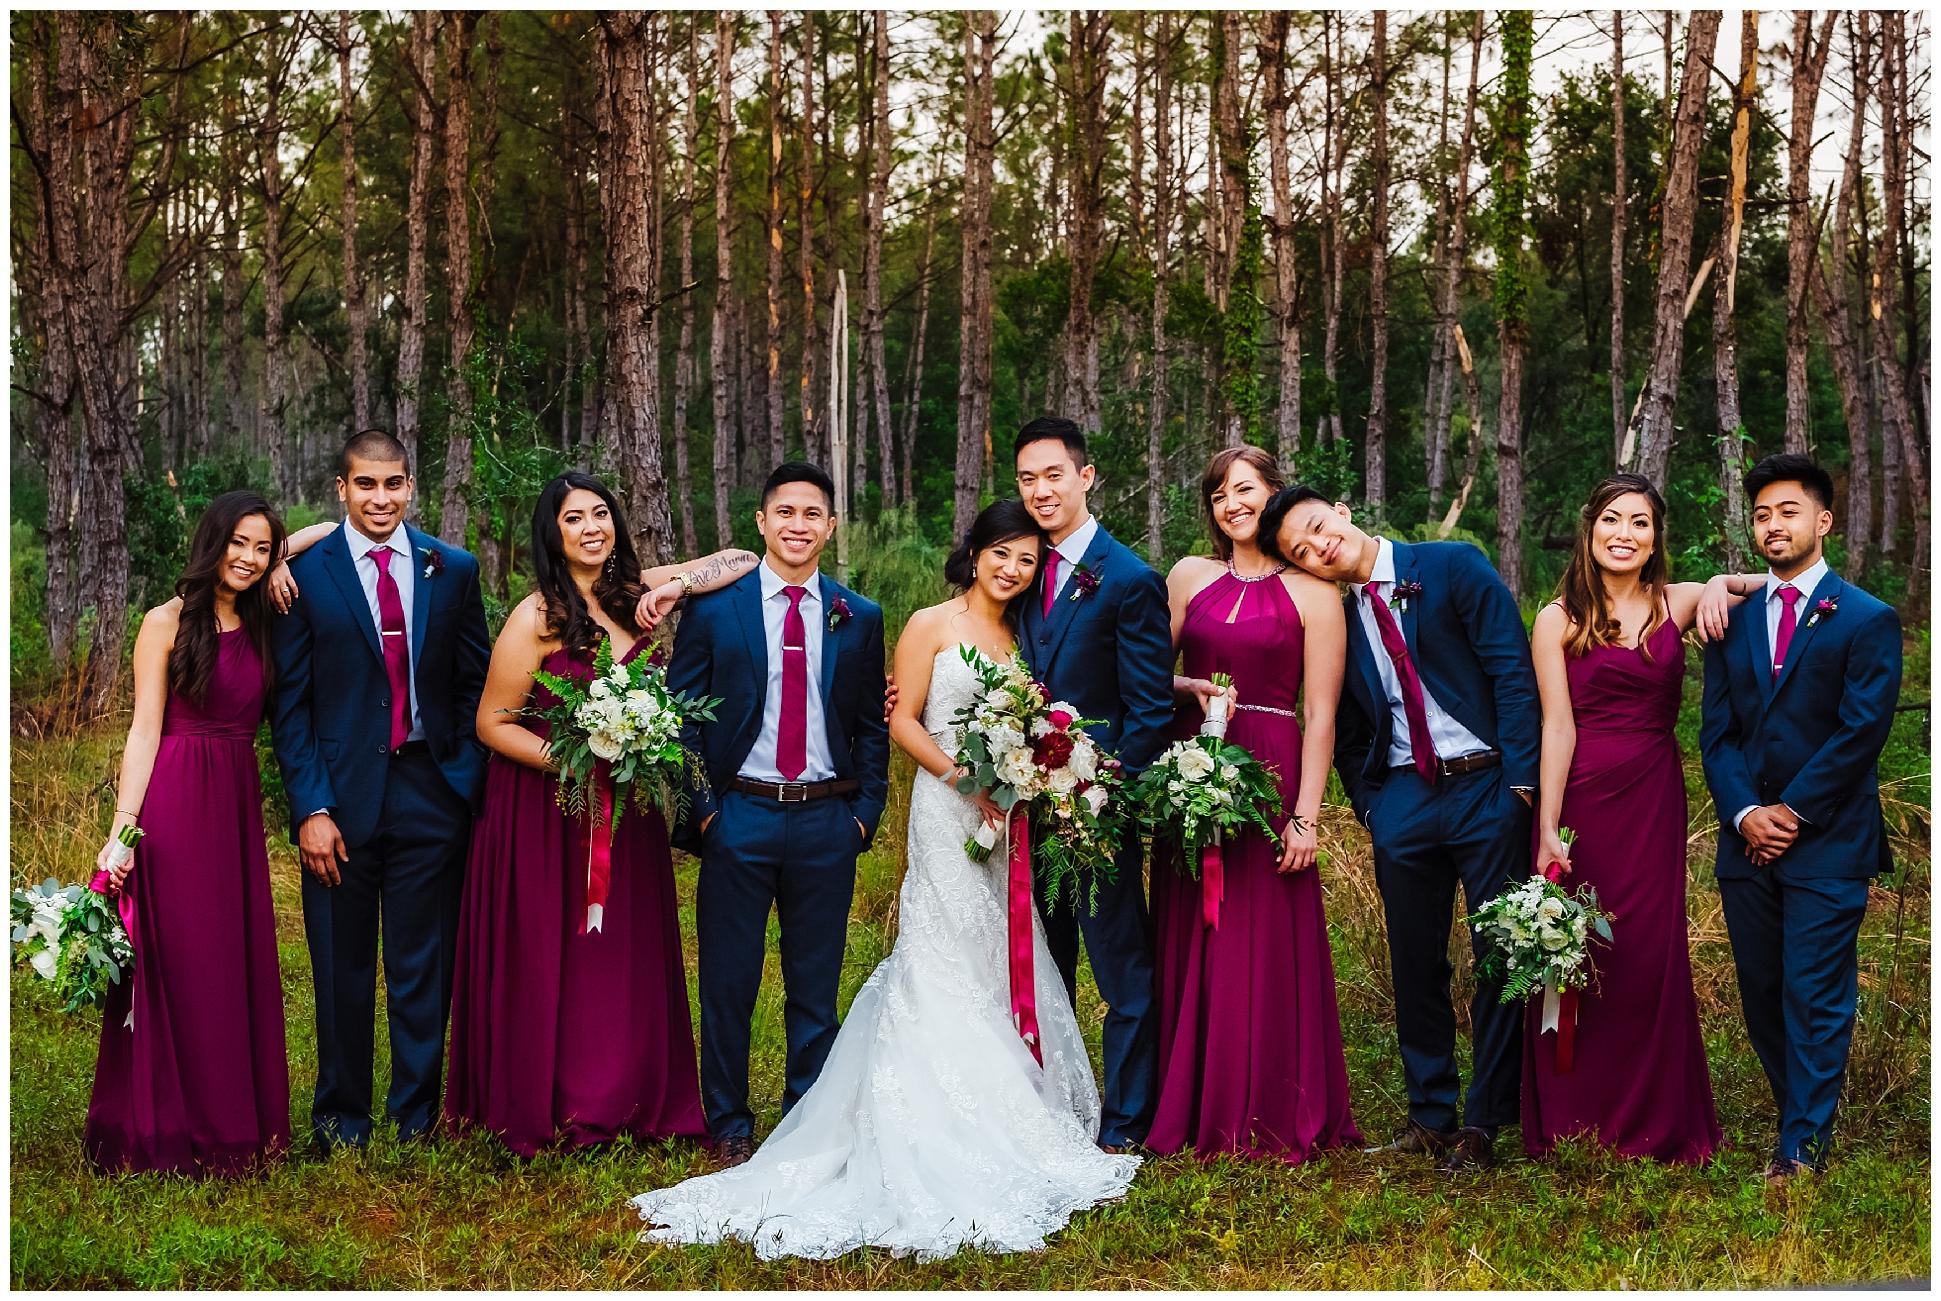 tampa-wedding-photographer-philipino-colorful-woods-ballroom-church-mass-confetti-fuscia_0044.jpg